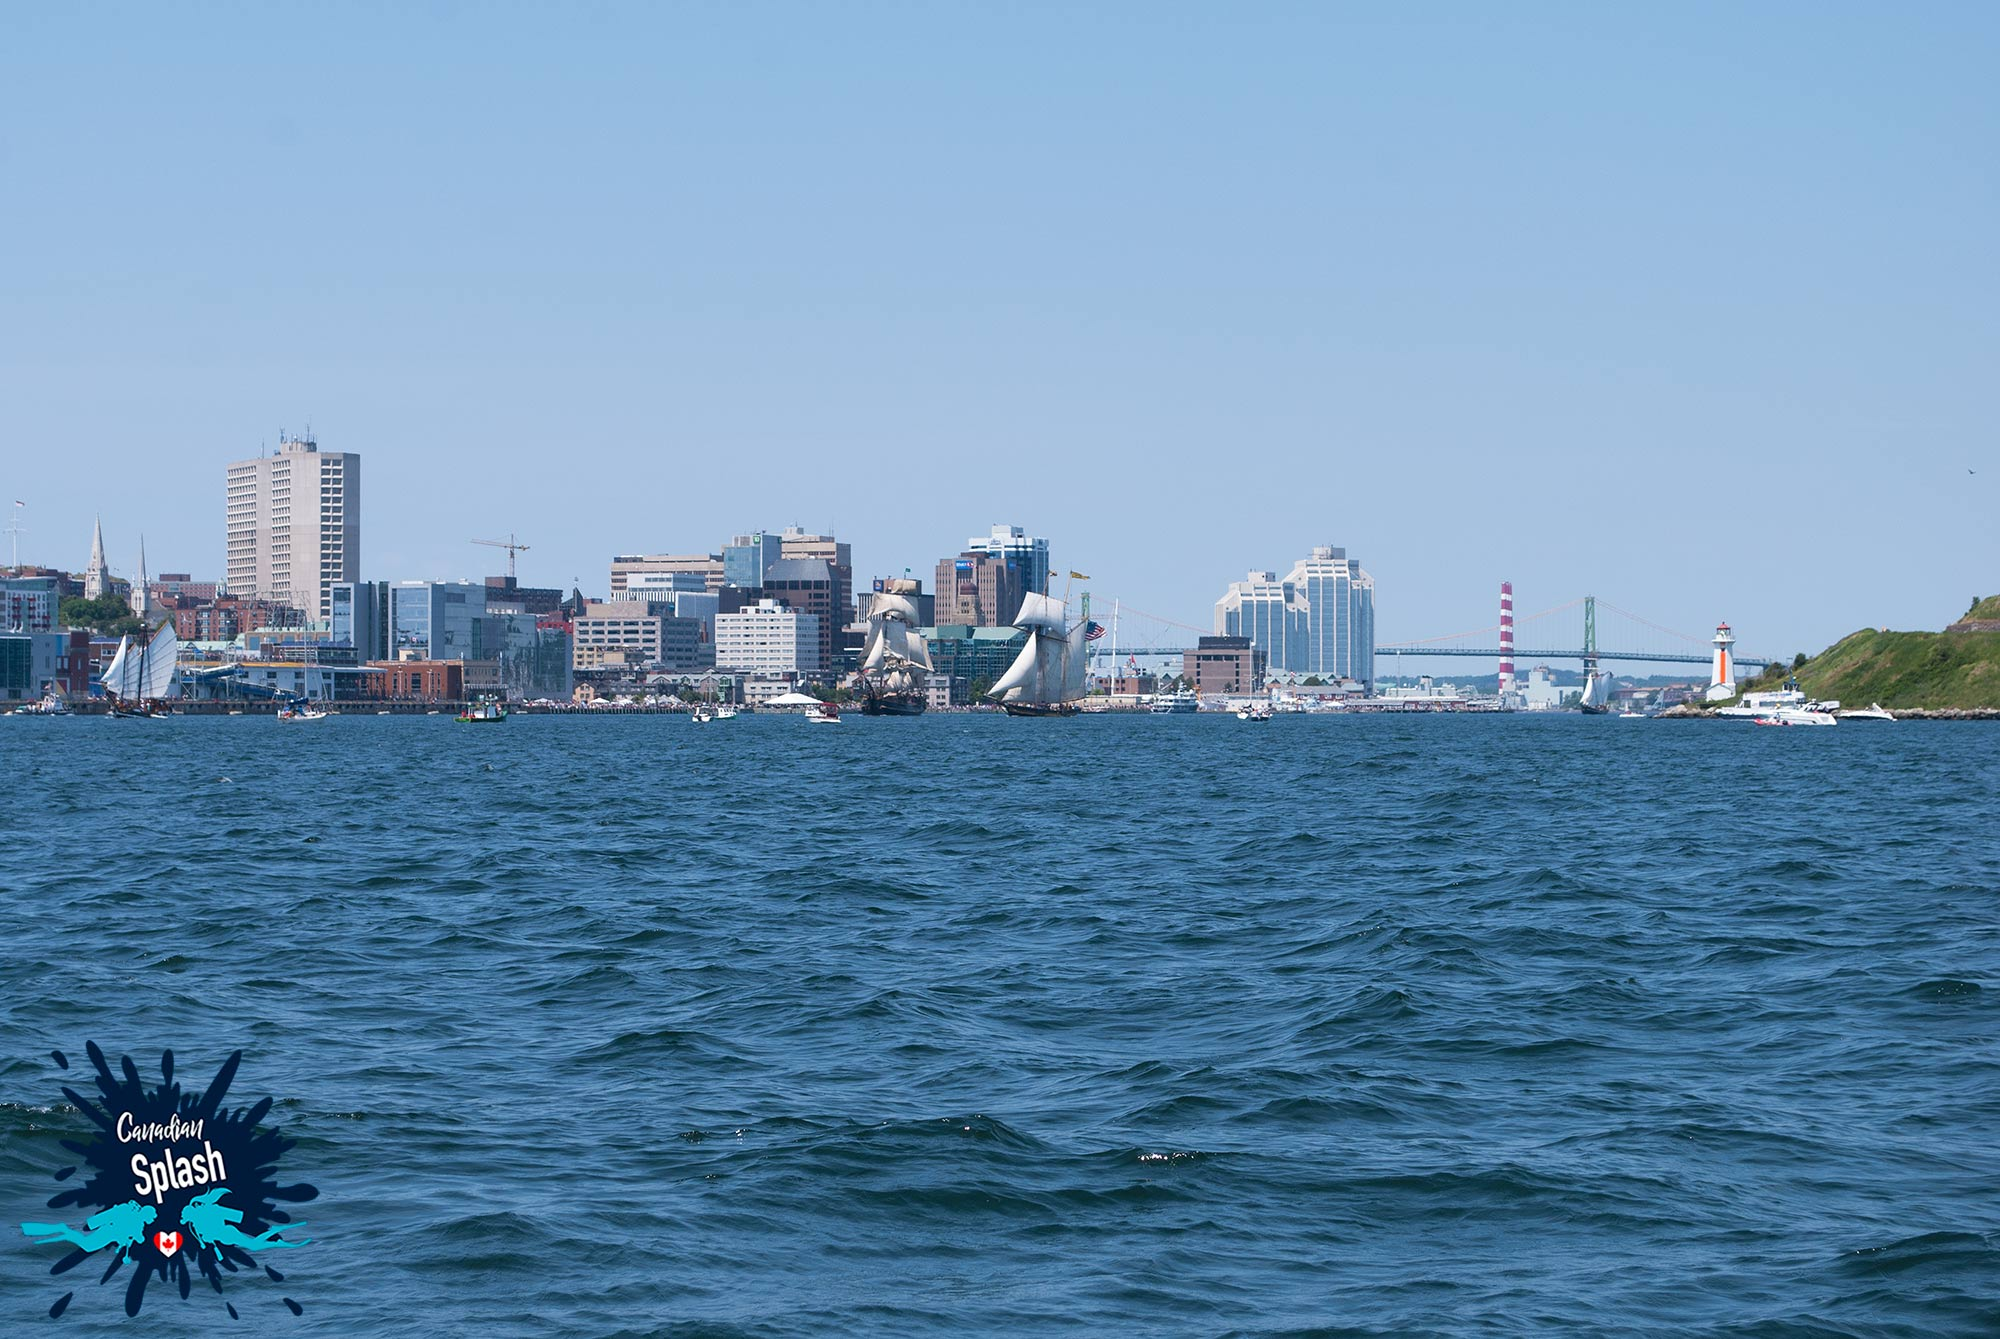 The Halifax Harbour And Cityscape, Nova Scotia, Canada